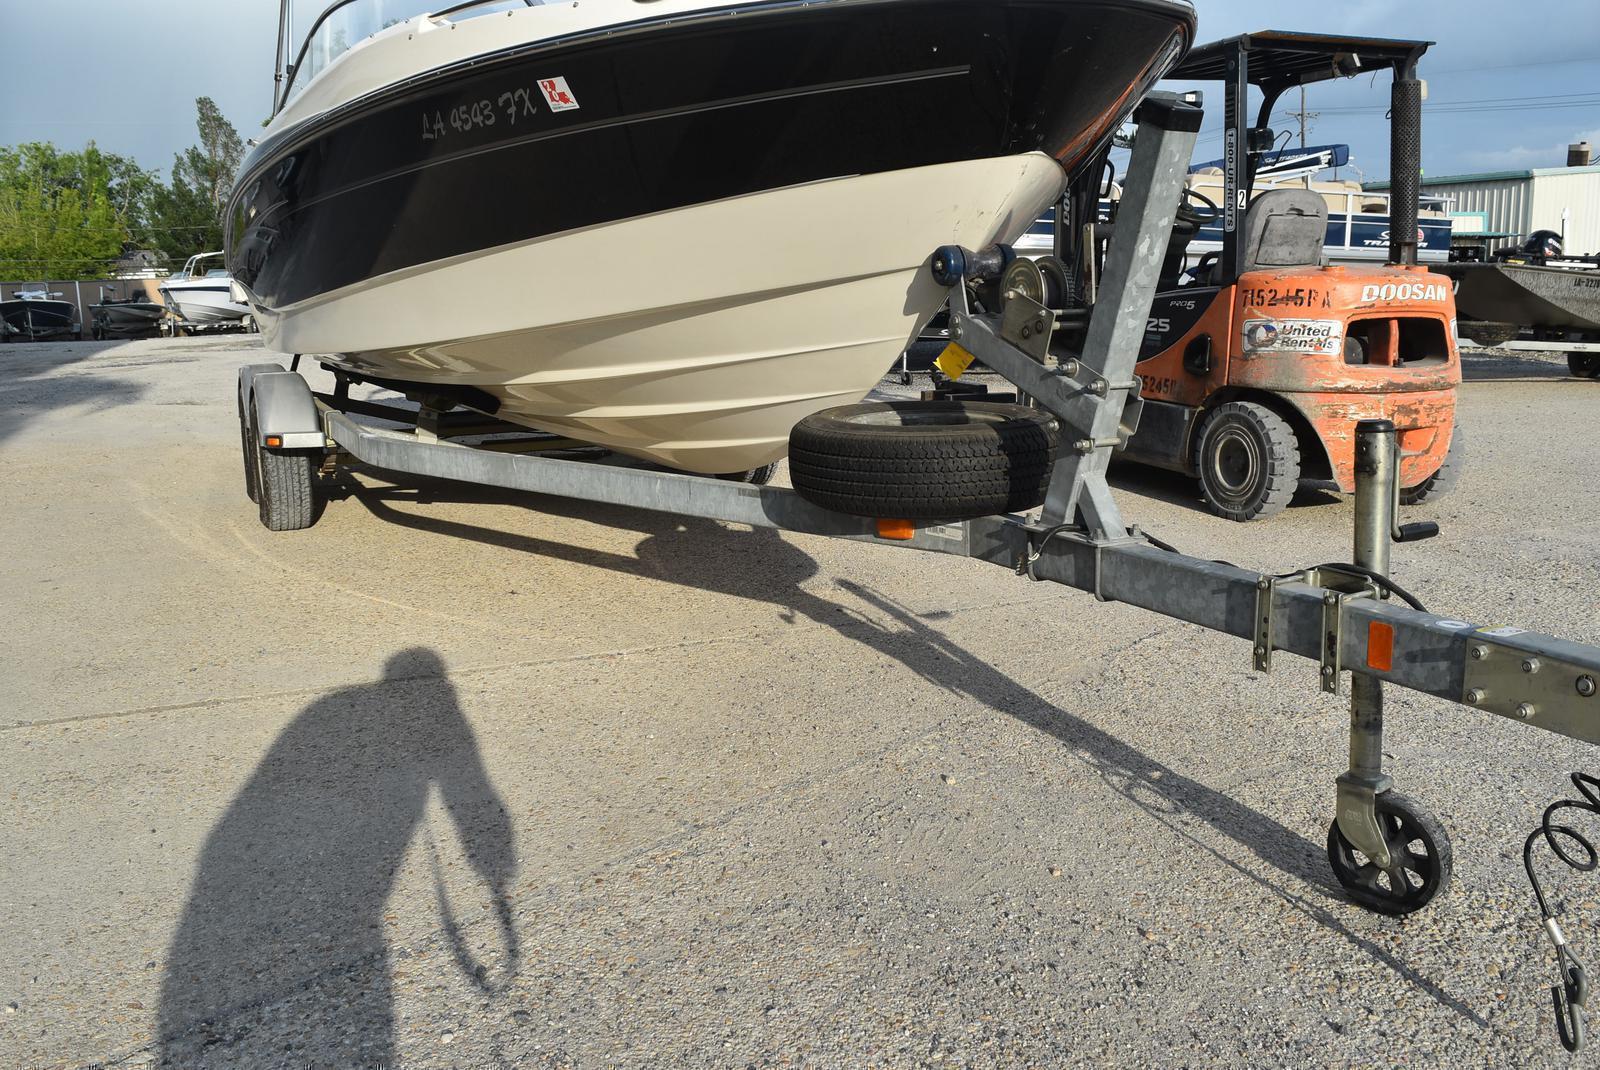 2010 Bayliner boat for sale, model of the boat is 235BR & Image # 35 of 43